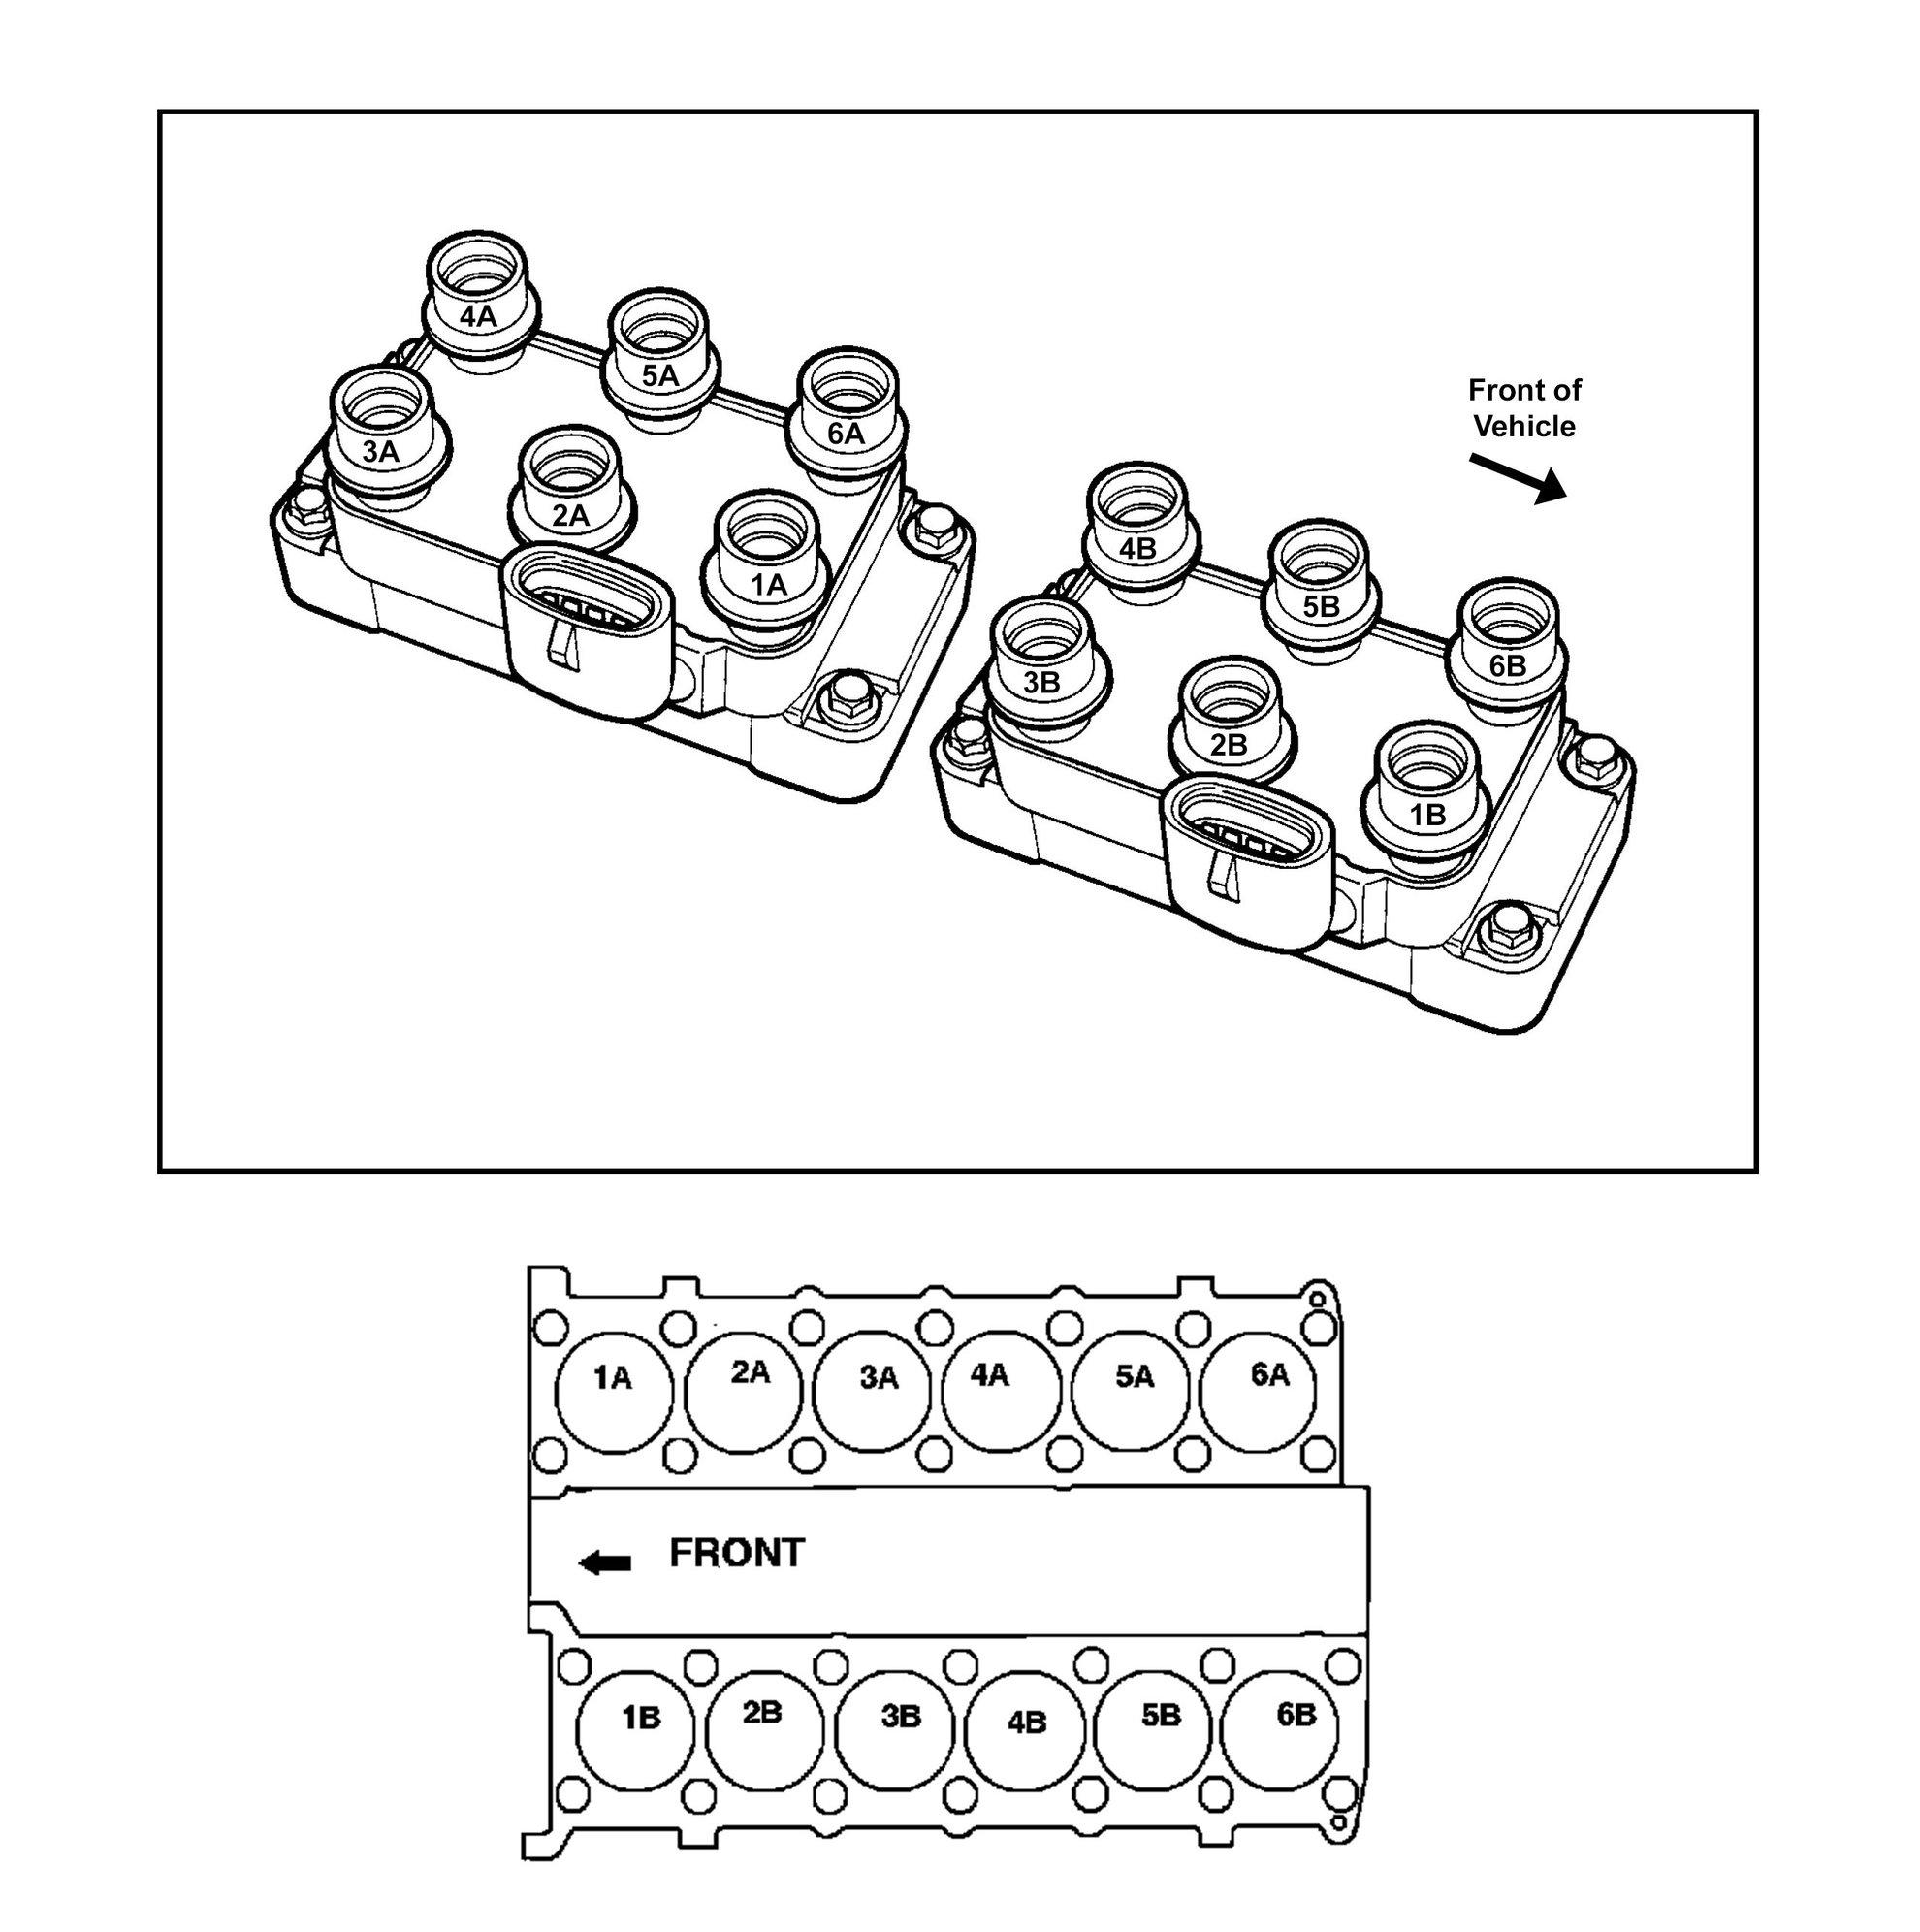 X305 Xj12 Coil Pack Diagram